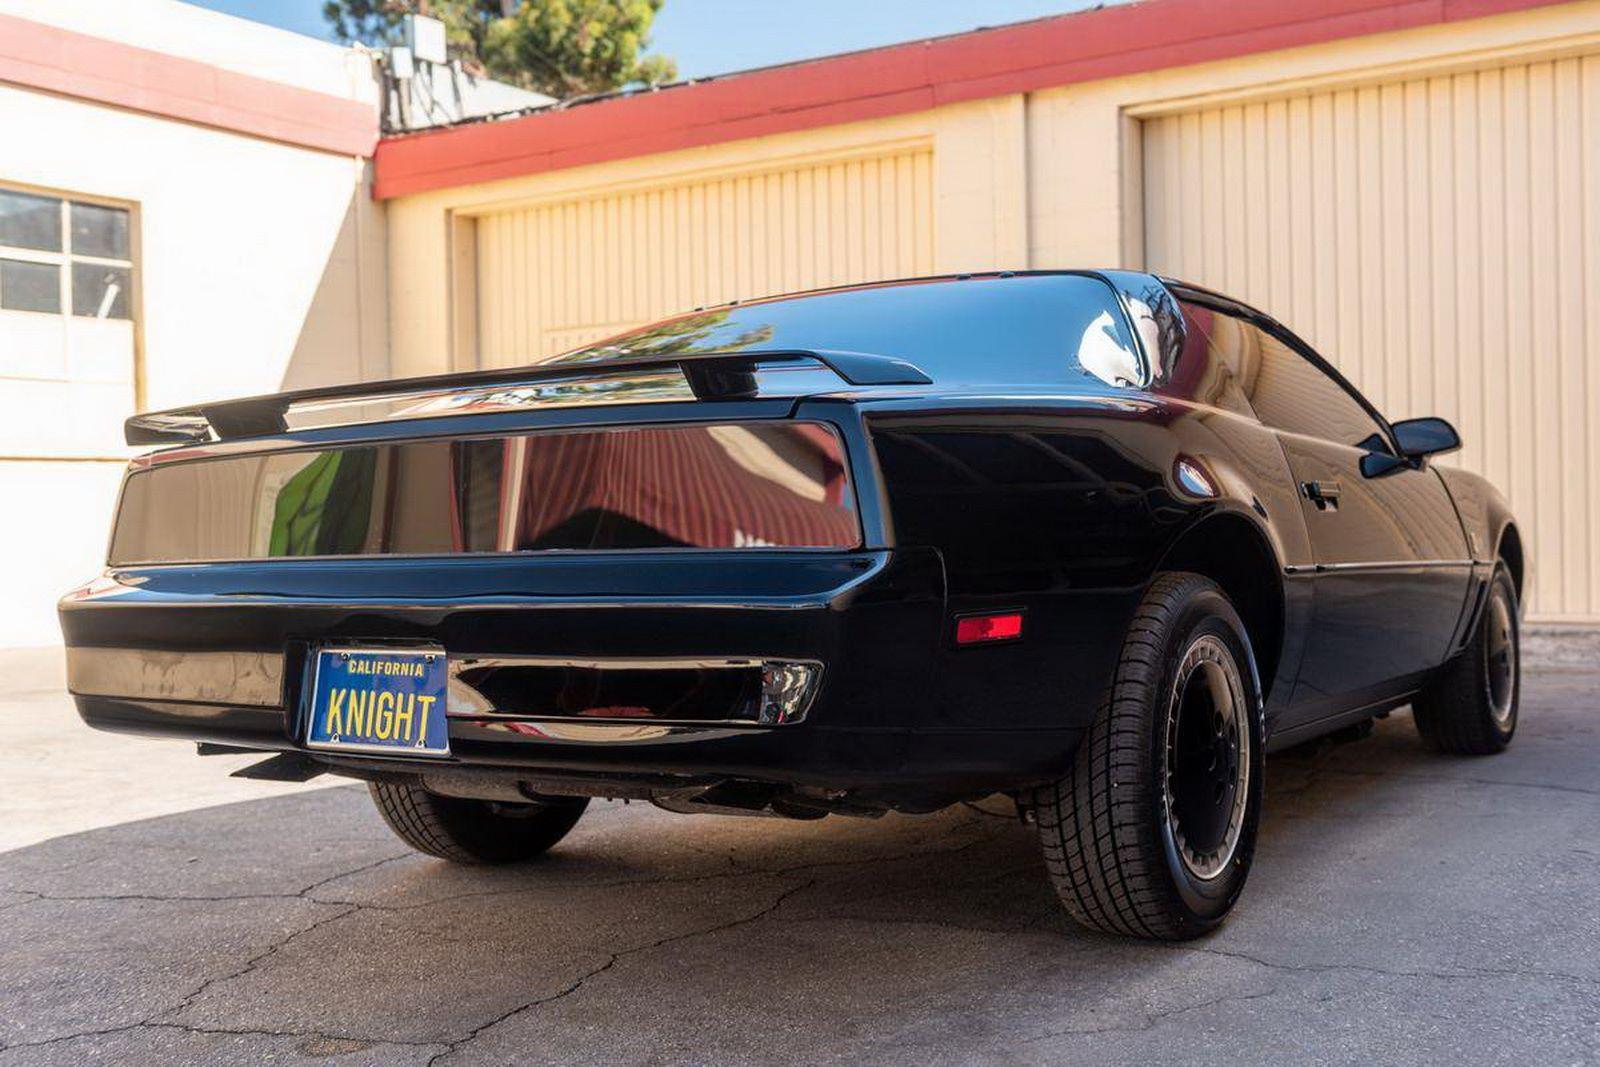 1982-pontiac-firebird-kitt-replica-george-barris-22